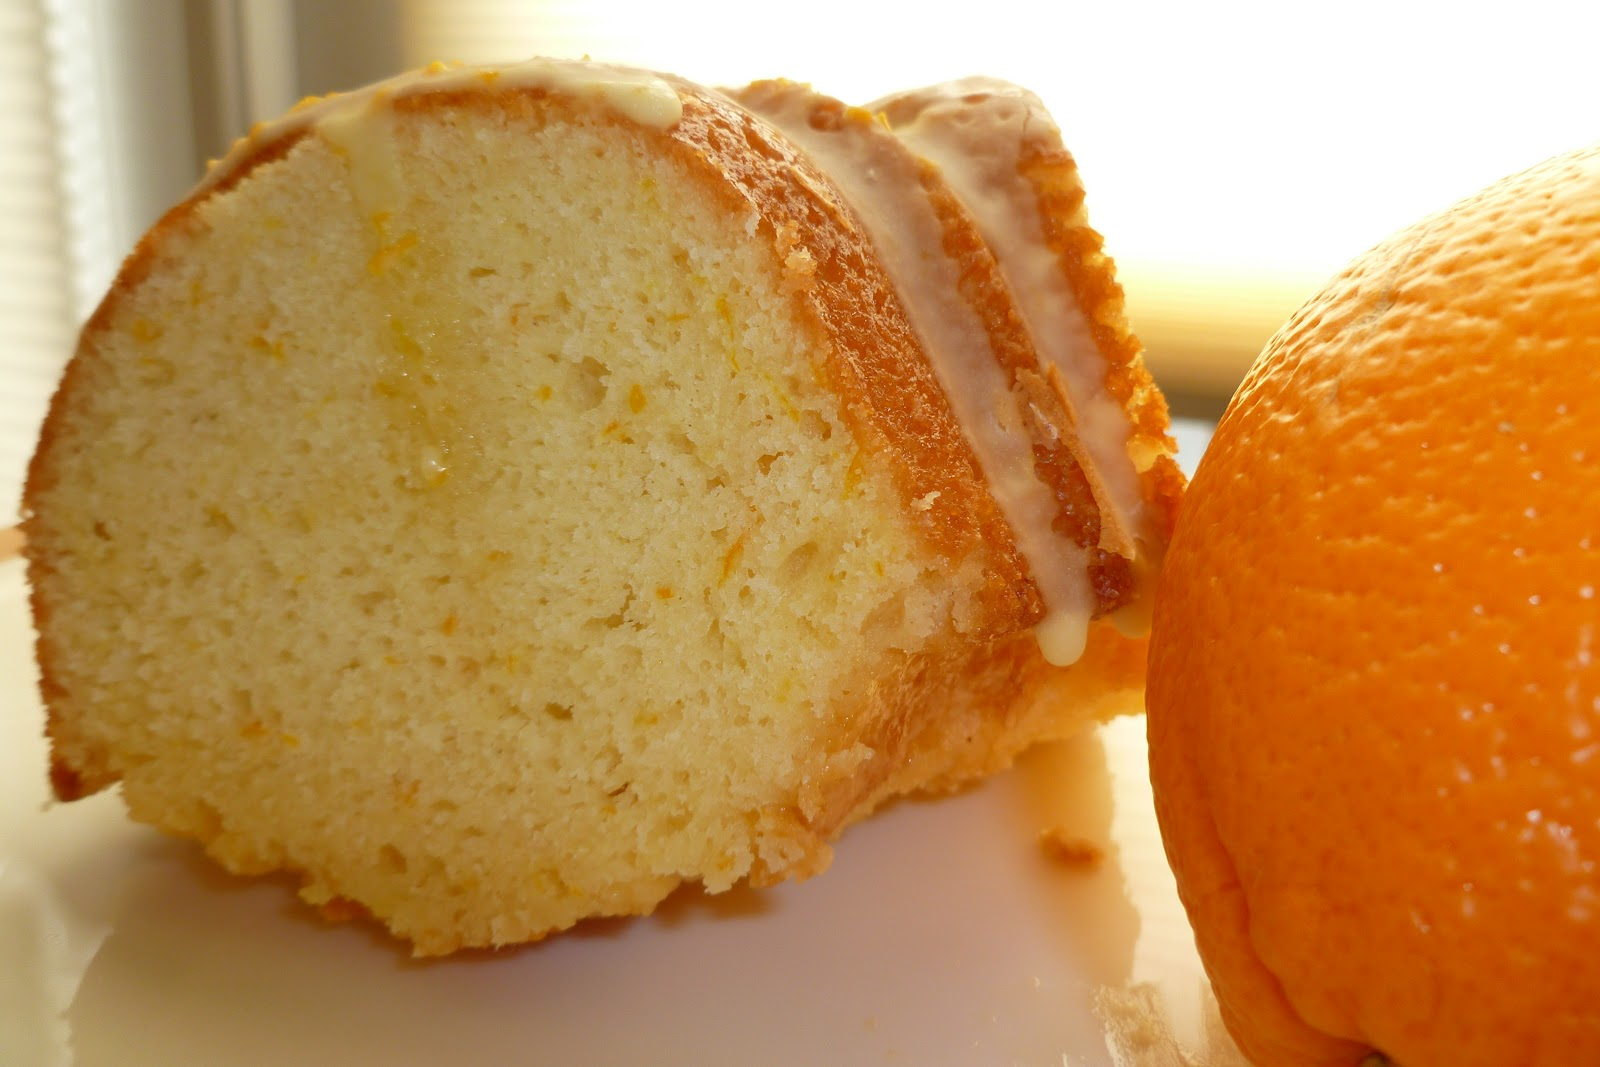 The Pastry Chef's Baking: Orange Cake a la Dorie Greenspan